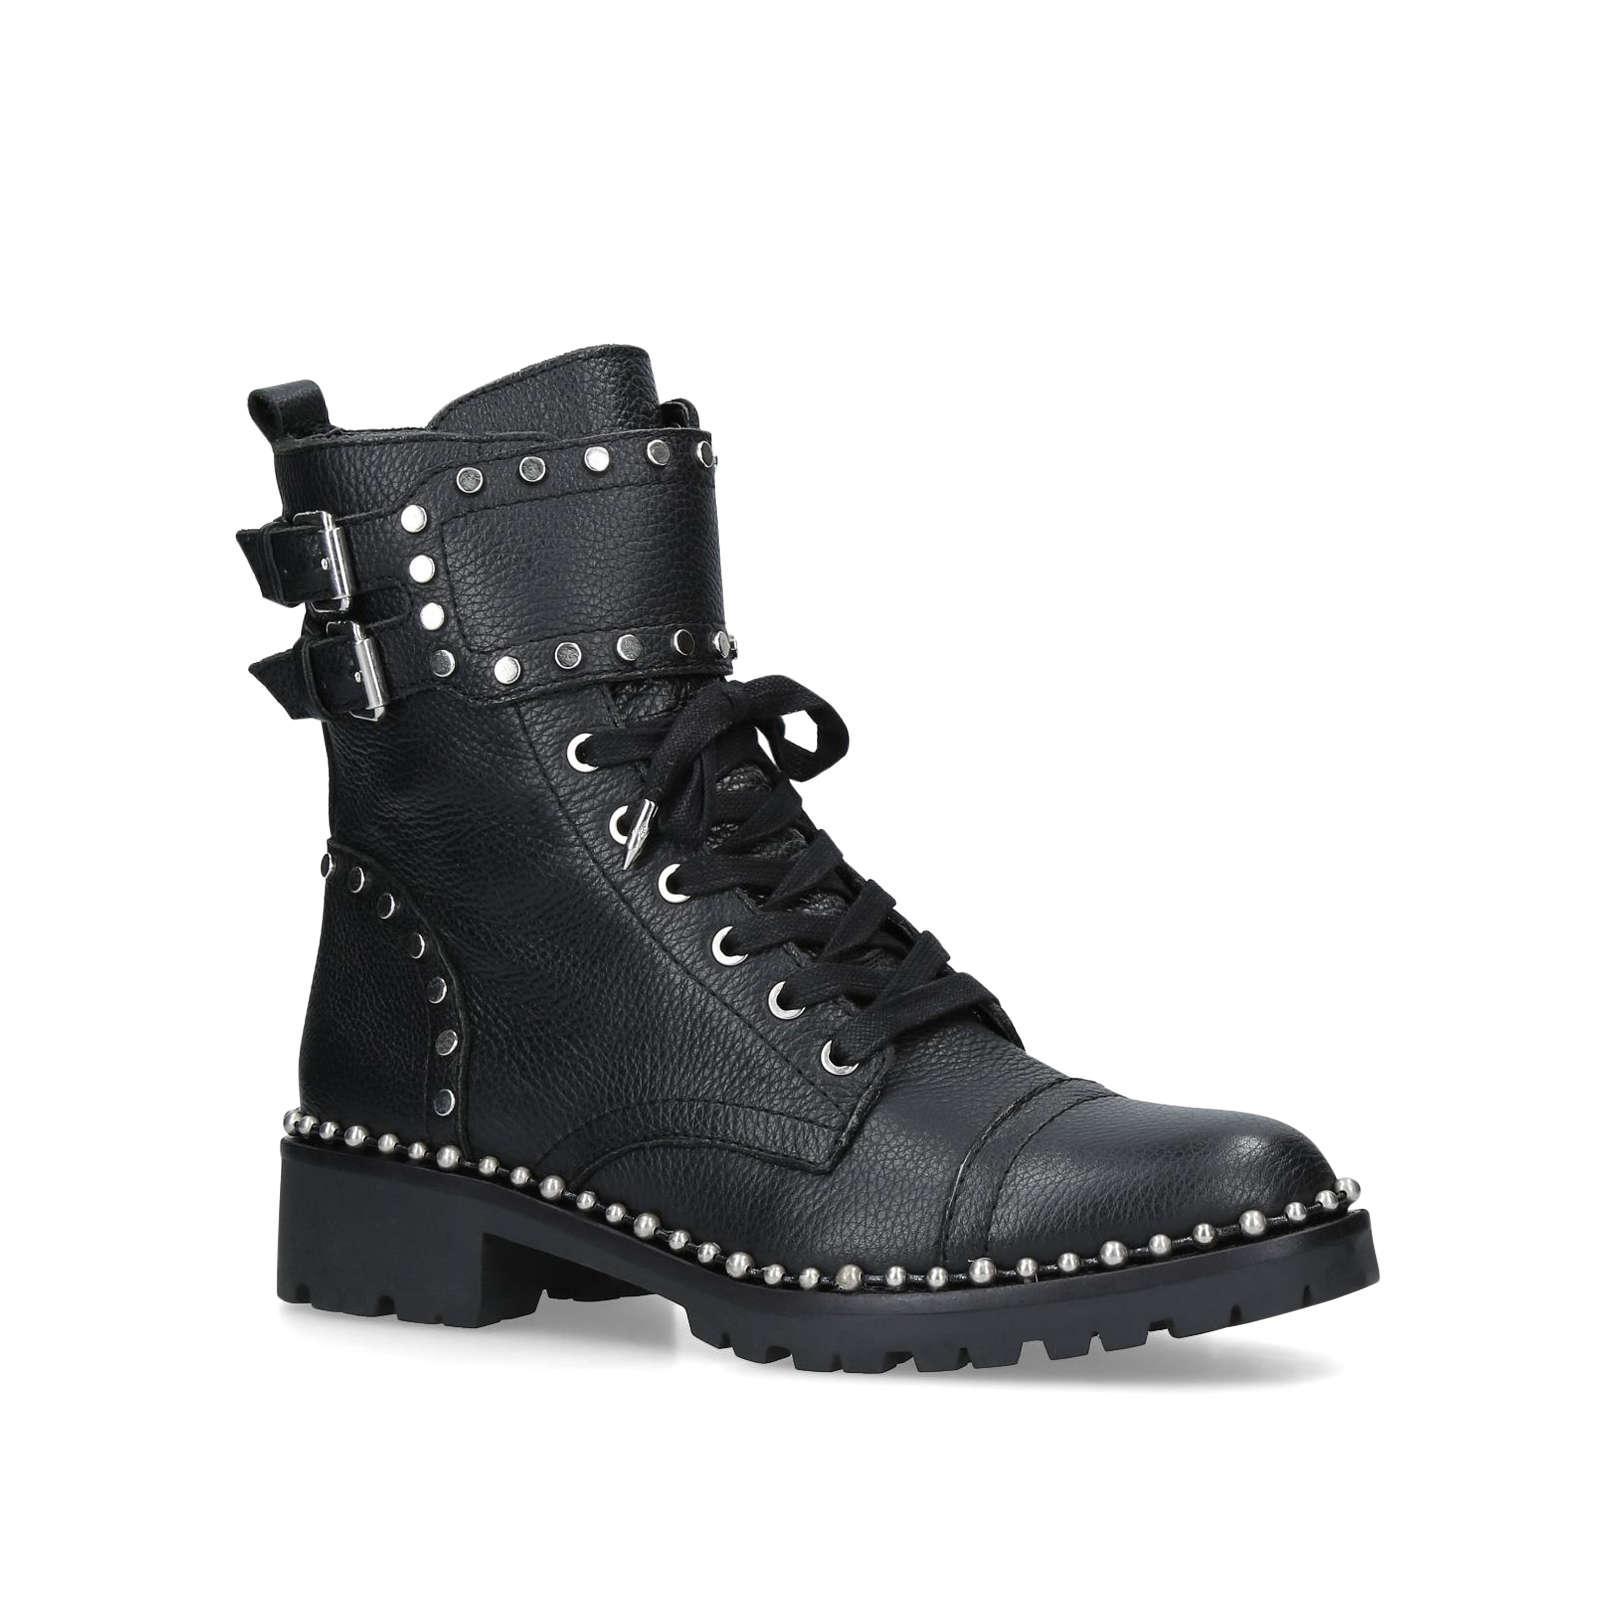 4e5820f5 Sam Edelman Jennifer Boot in Black - Lyst